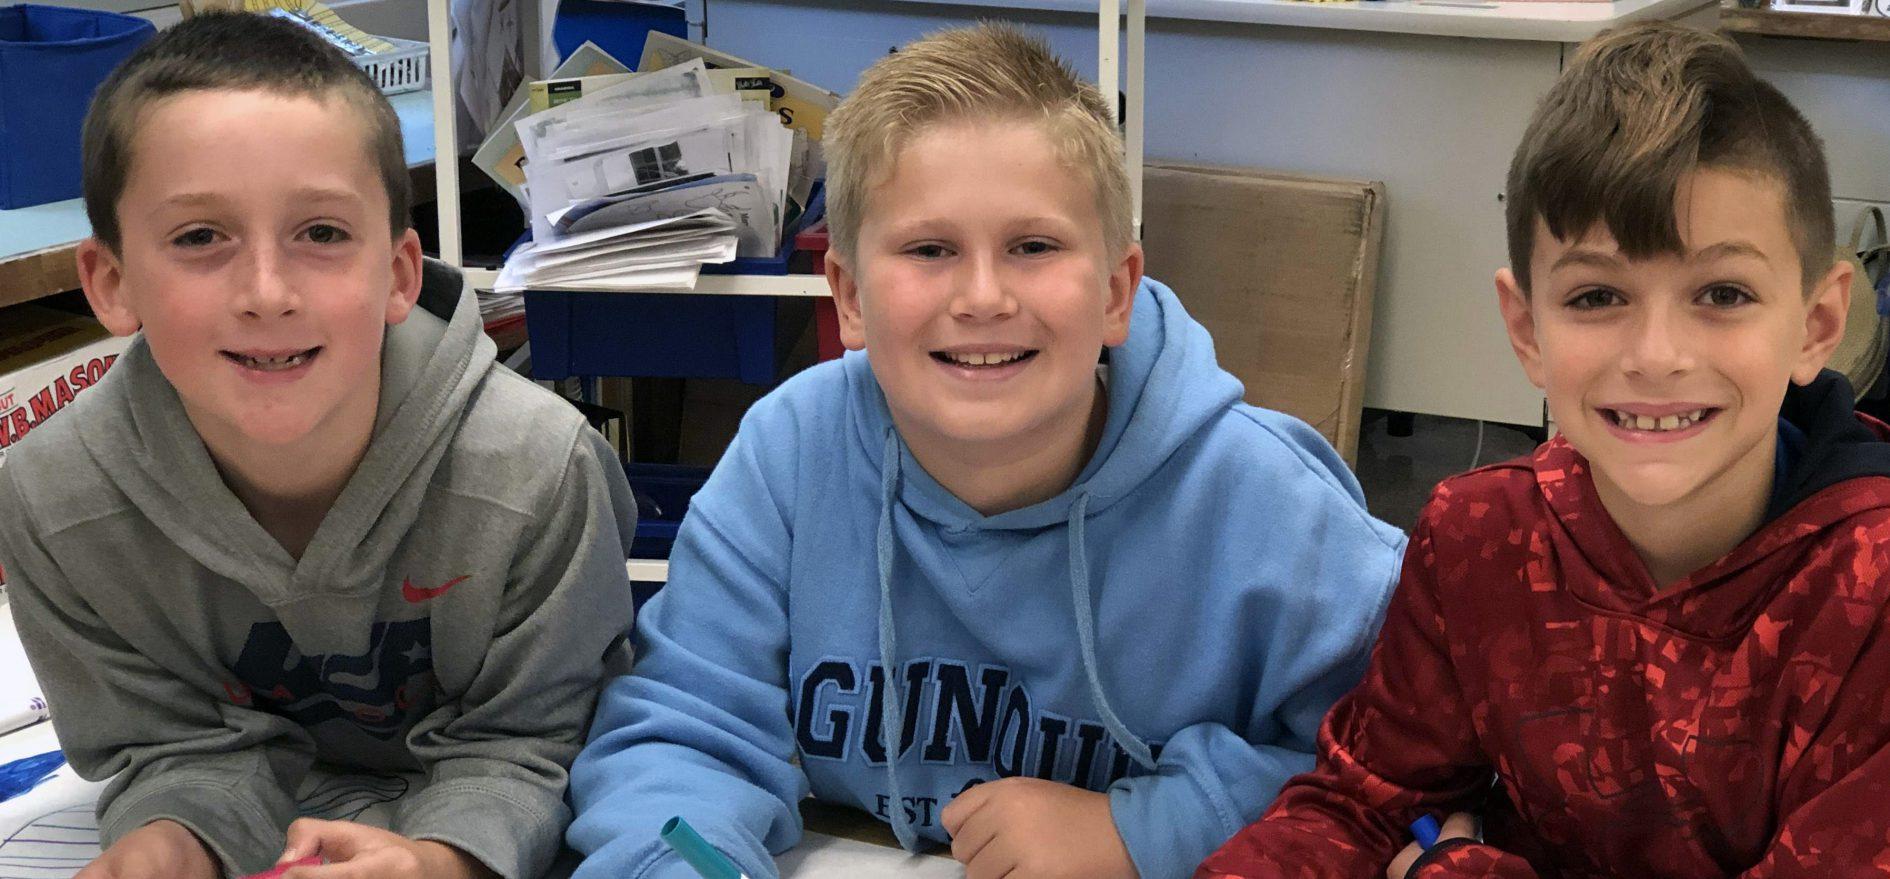 Three second grade boys smile for a photo